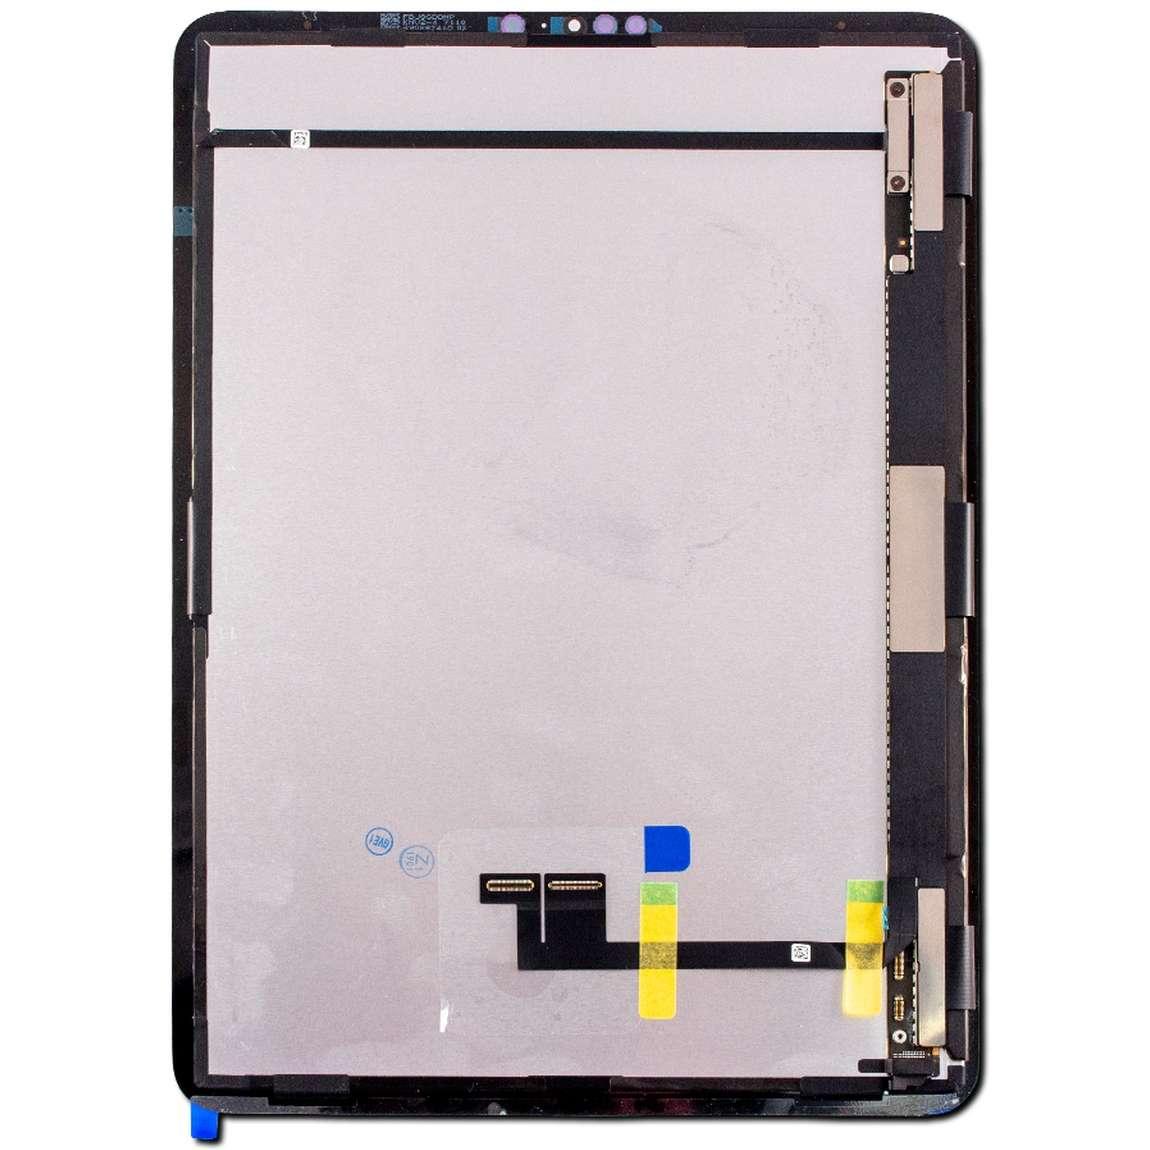 Ansamblu LCD Display Touchscreen Apple iPad Pro 11 2018 A1979 Negru imagine powerlaptop.ro 2021